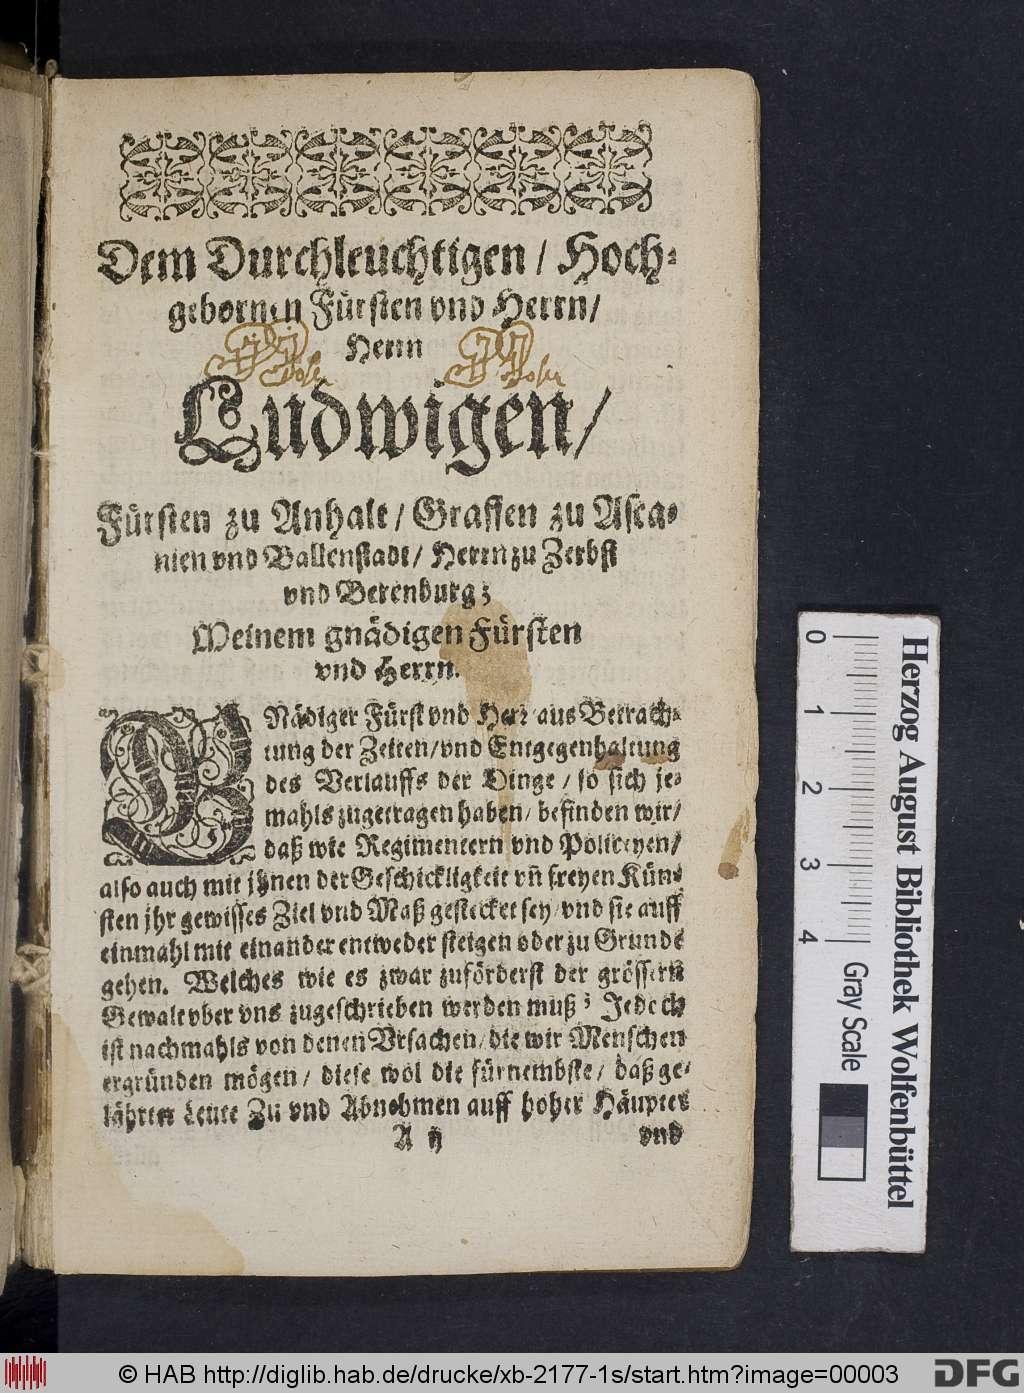 http://diglib.hab.de/drucke/xb-2177-1s/00003.jpg